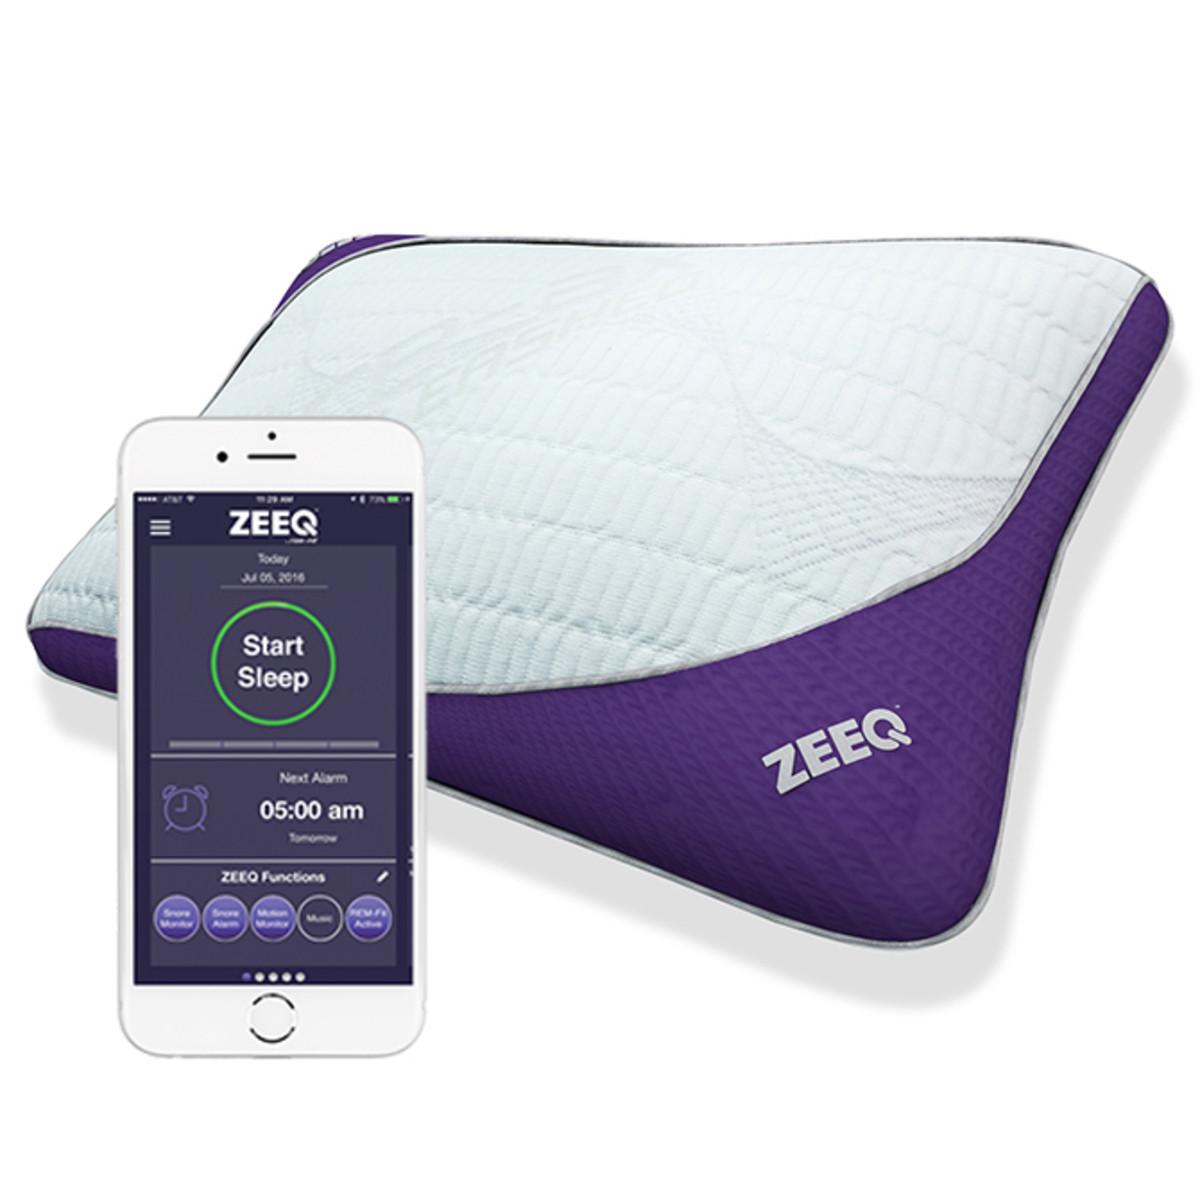 zeeq-pillow-time-syn-sleep.jpg